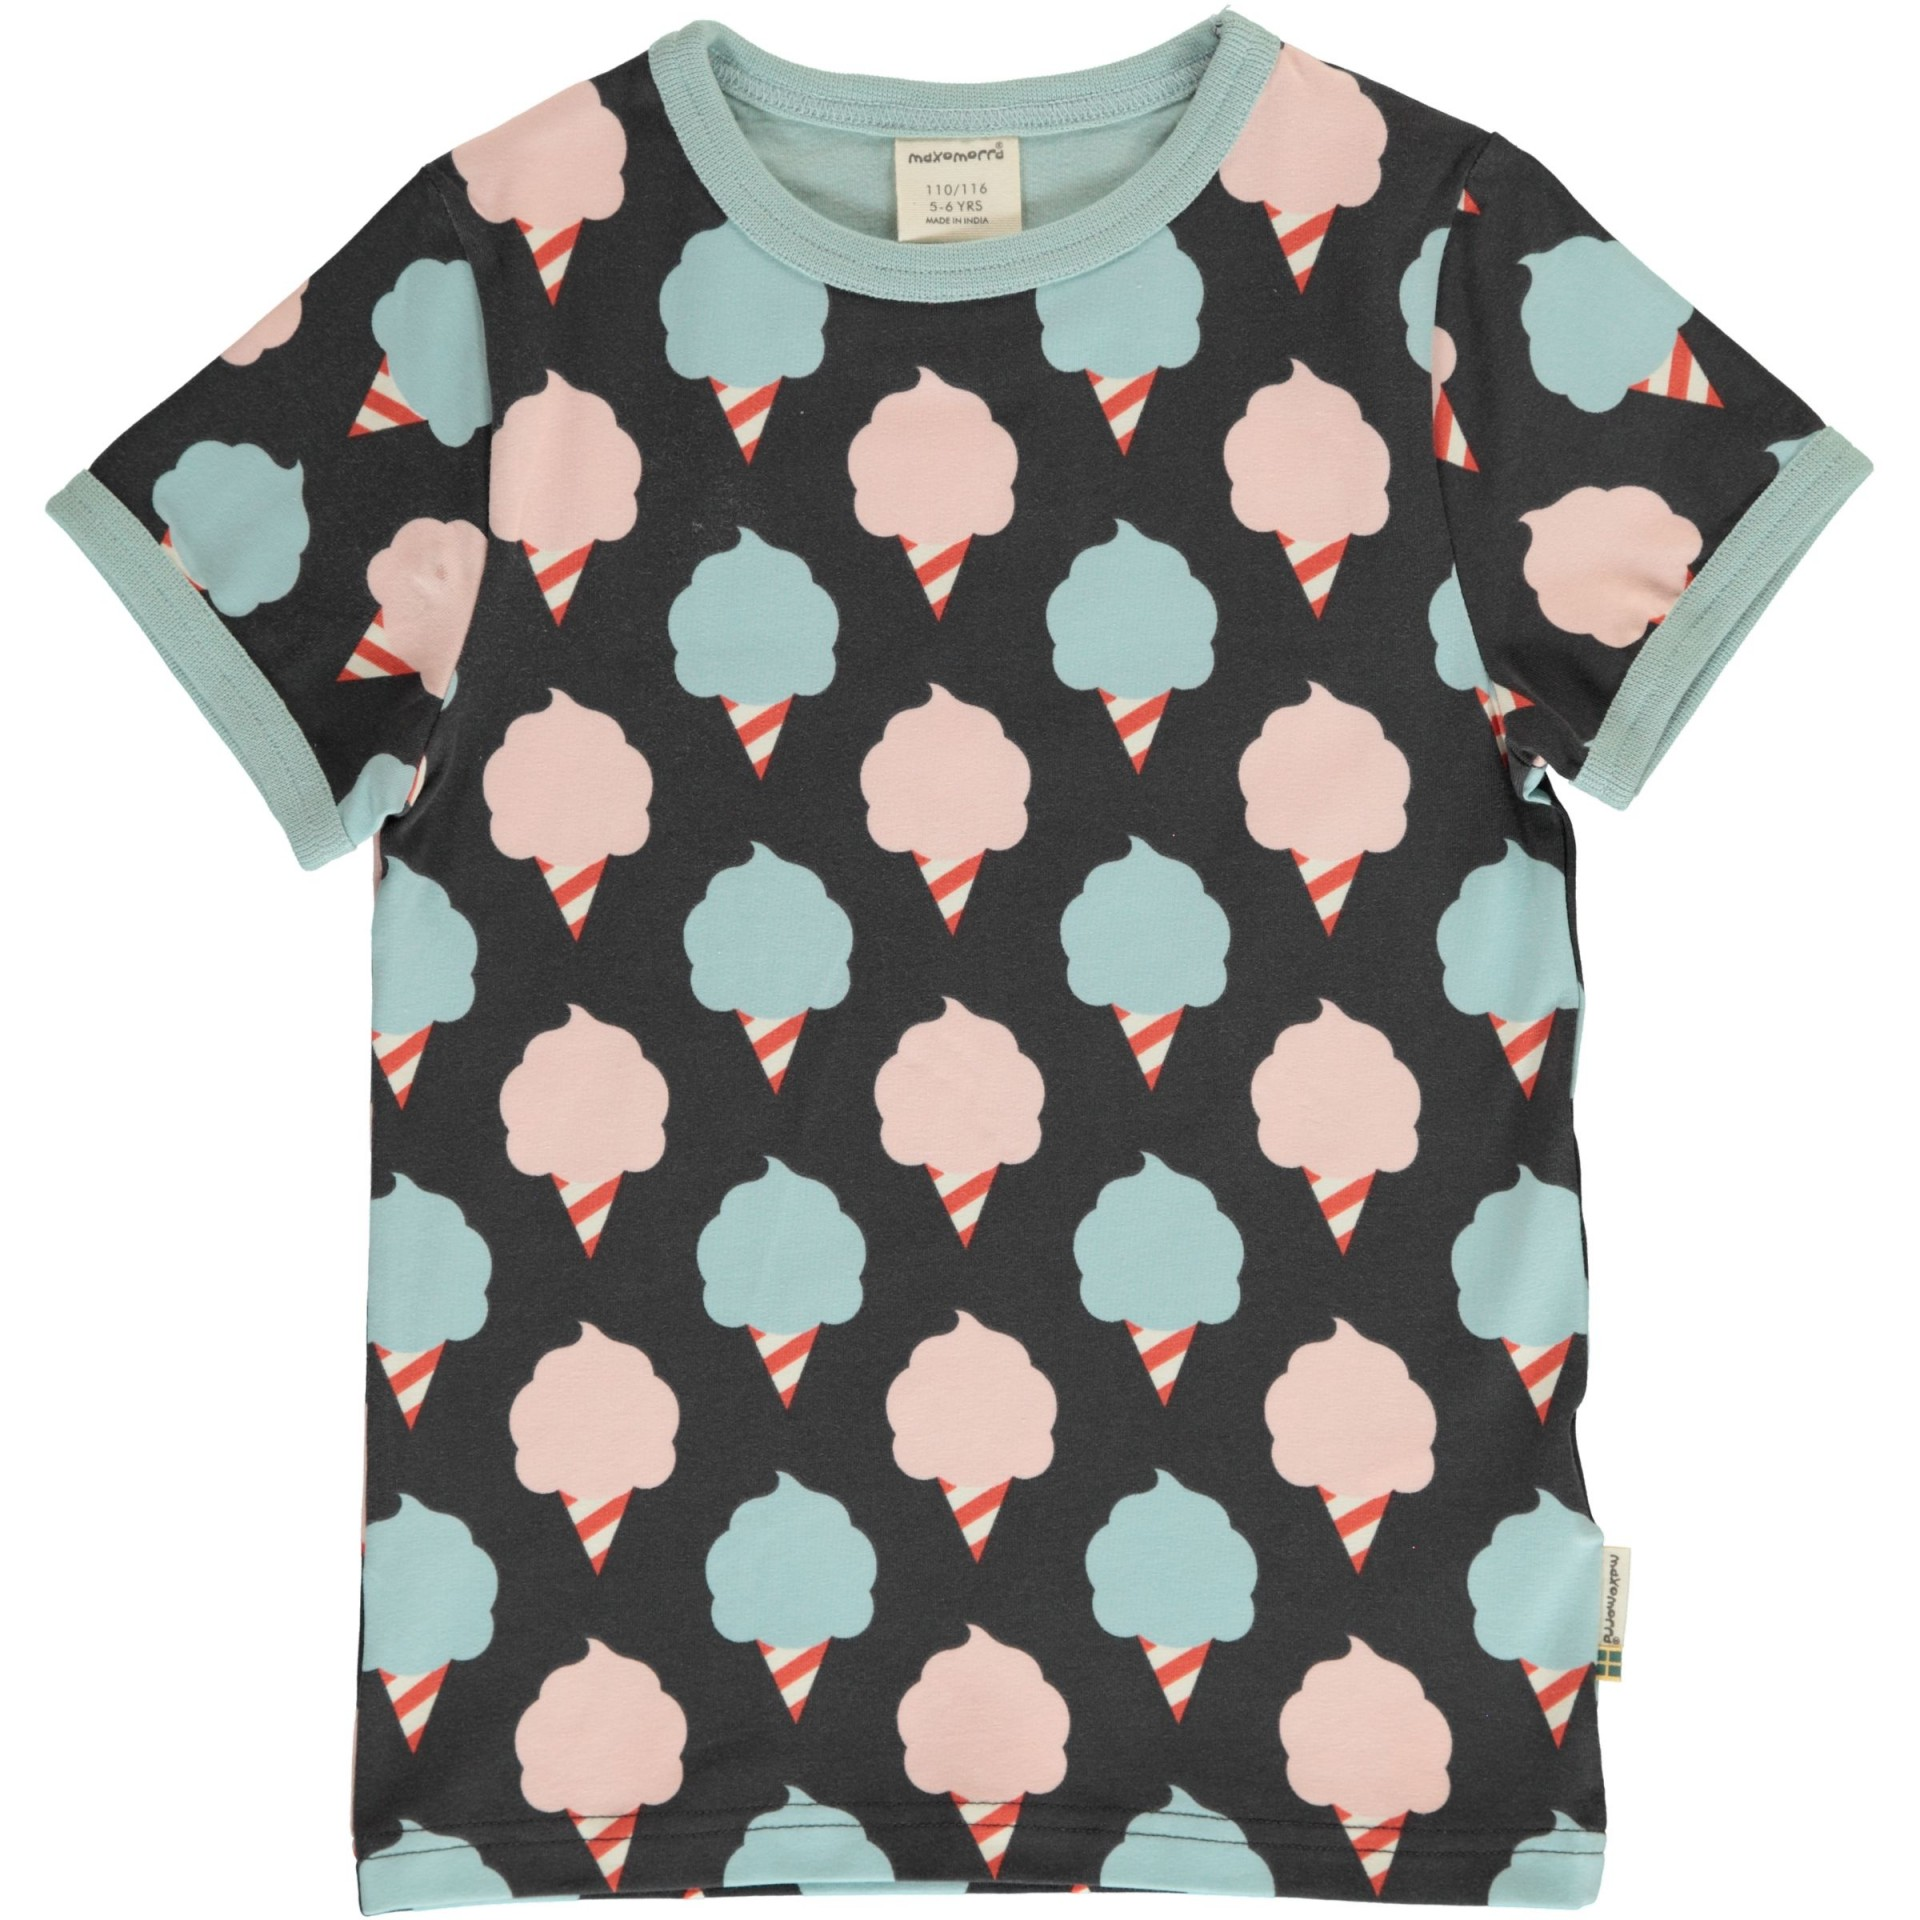 T-shirt Sweet Cotton Candy Maxomorra (Tamanhos disponíveis 18-24m, 3-4a, 7-8a)